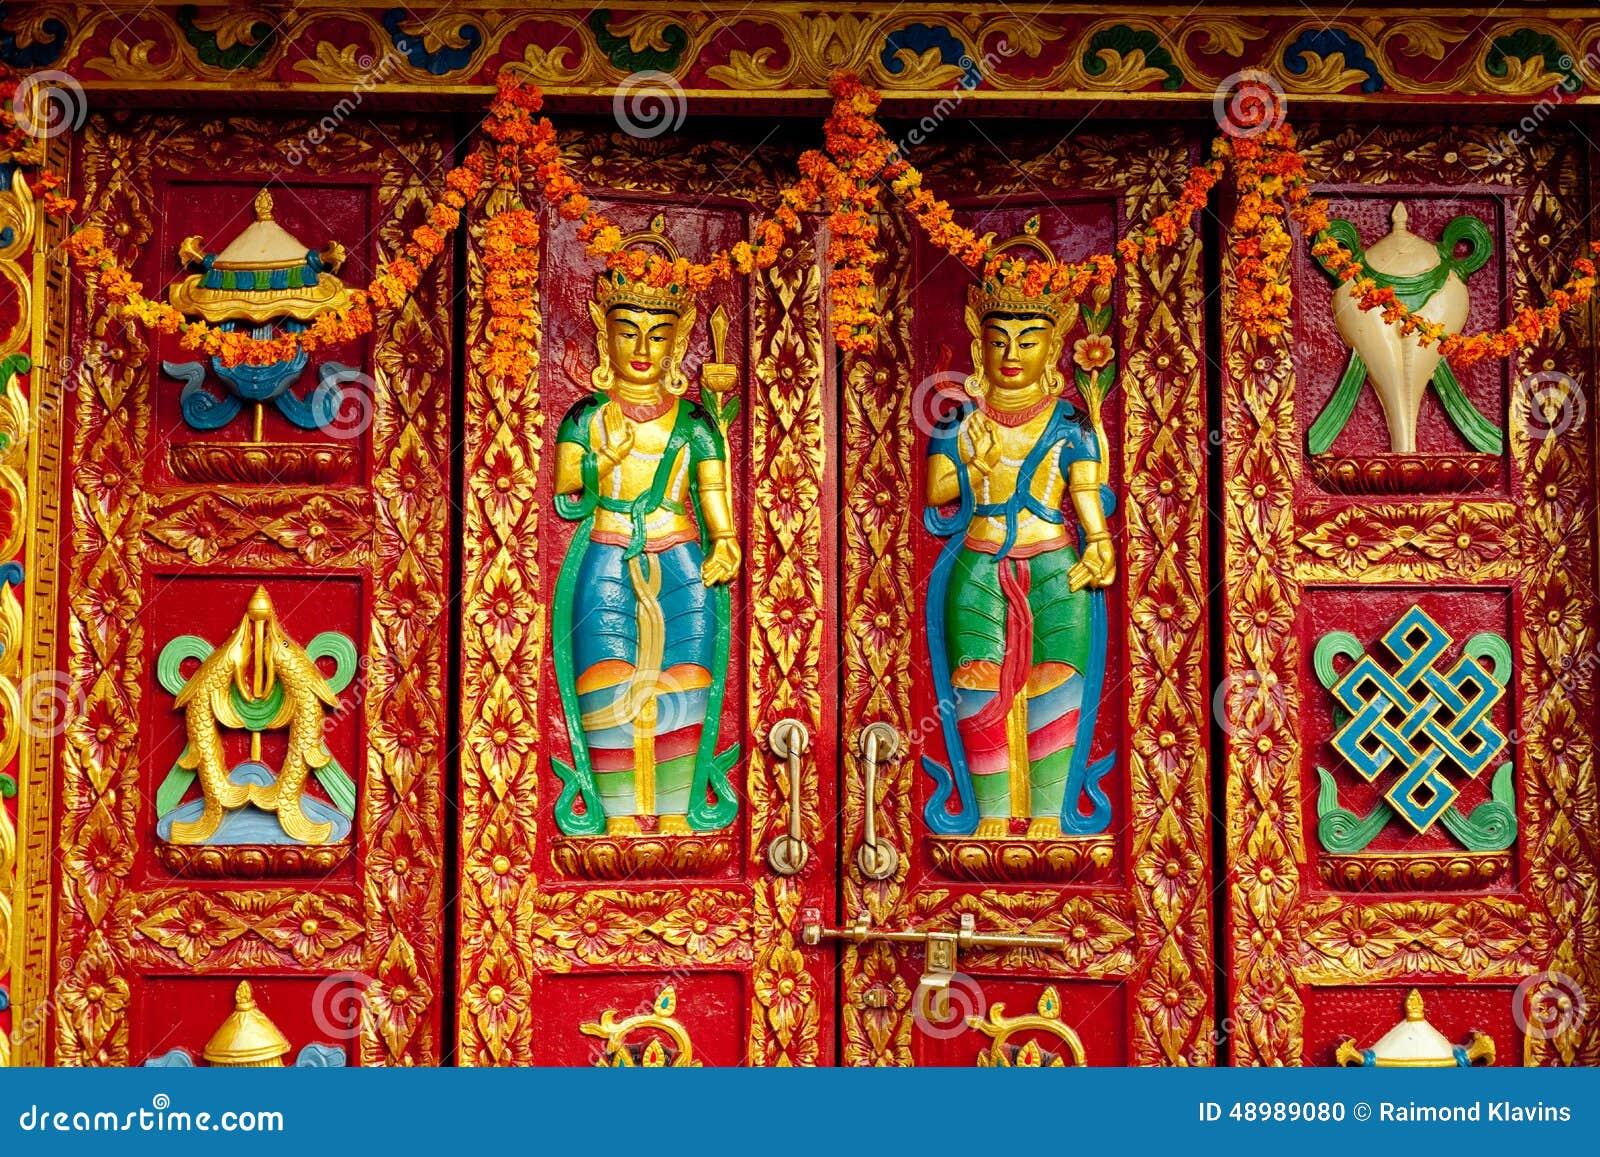 Buddhist ornament colorful door in Monastery near stupa Boudhanath